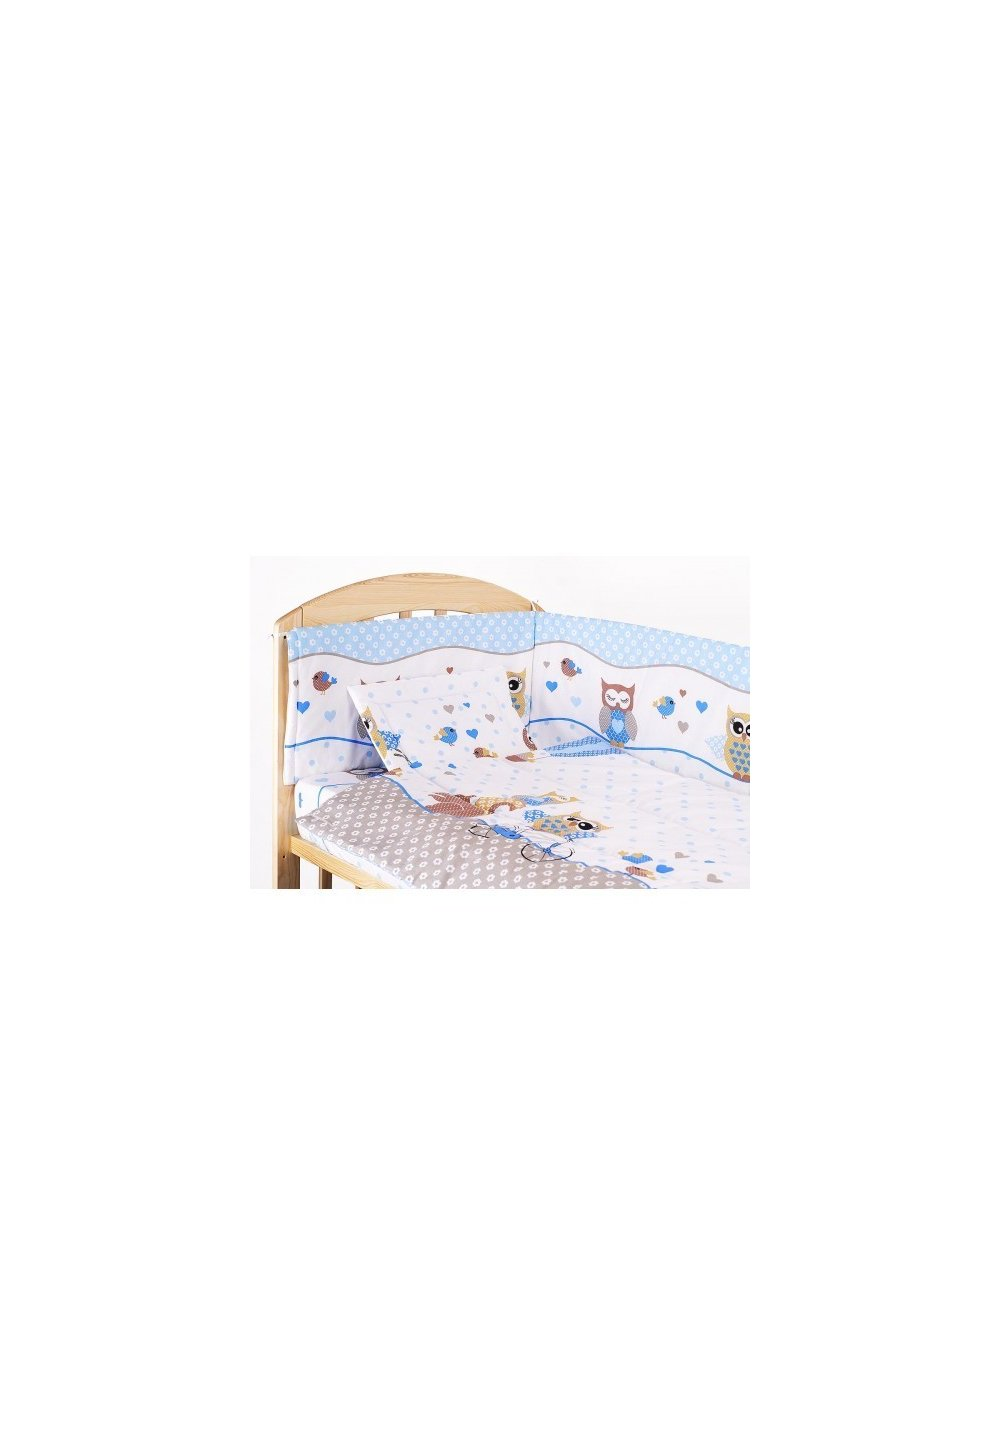 Lenjerie patut, 5 piese, Bufinite albastre, 140x70 cm imagine